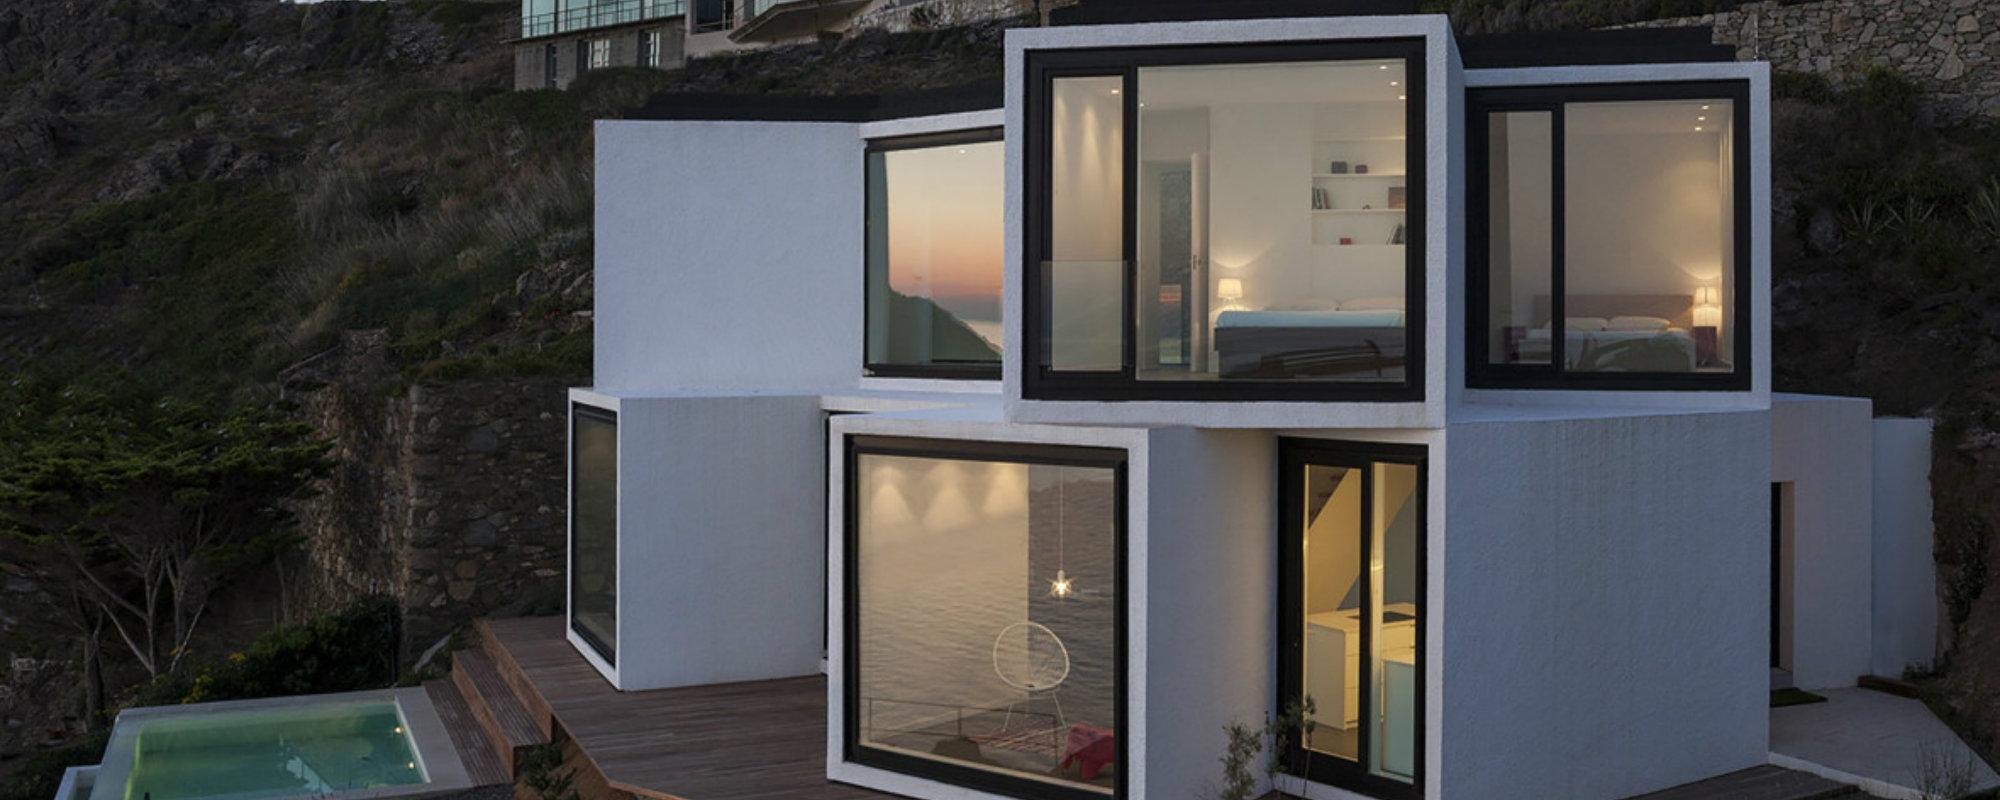 arquitectura de lujo Arquitectura de Lujo: Cadaval & Solà-Morales una casa de Hermosa Featured 2